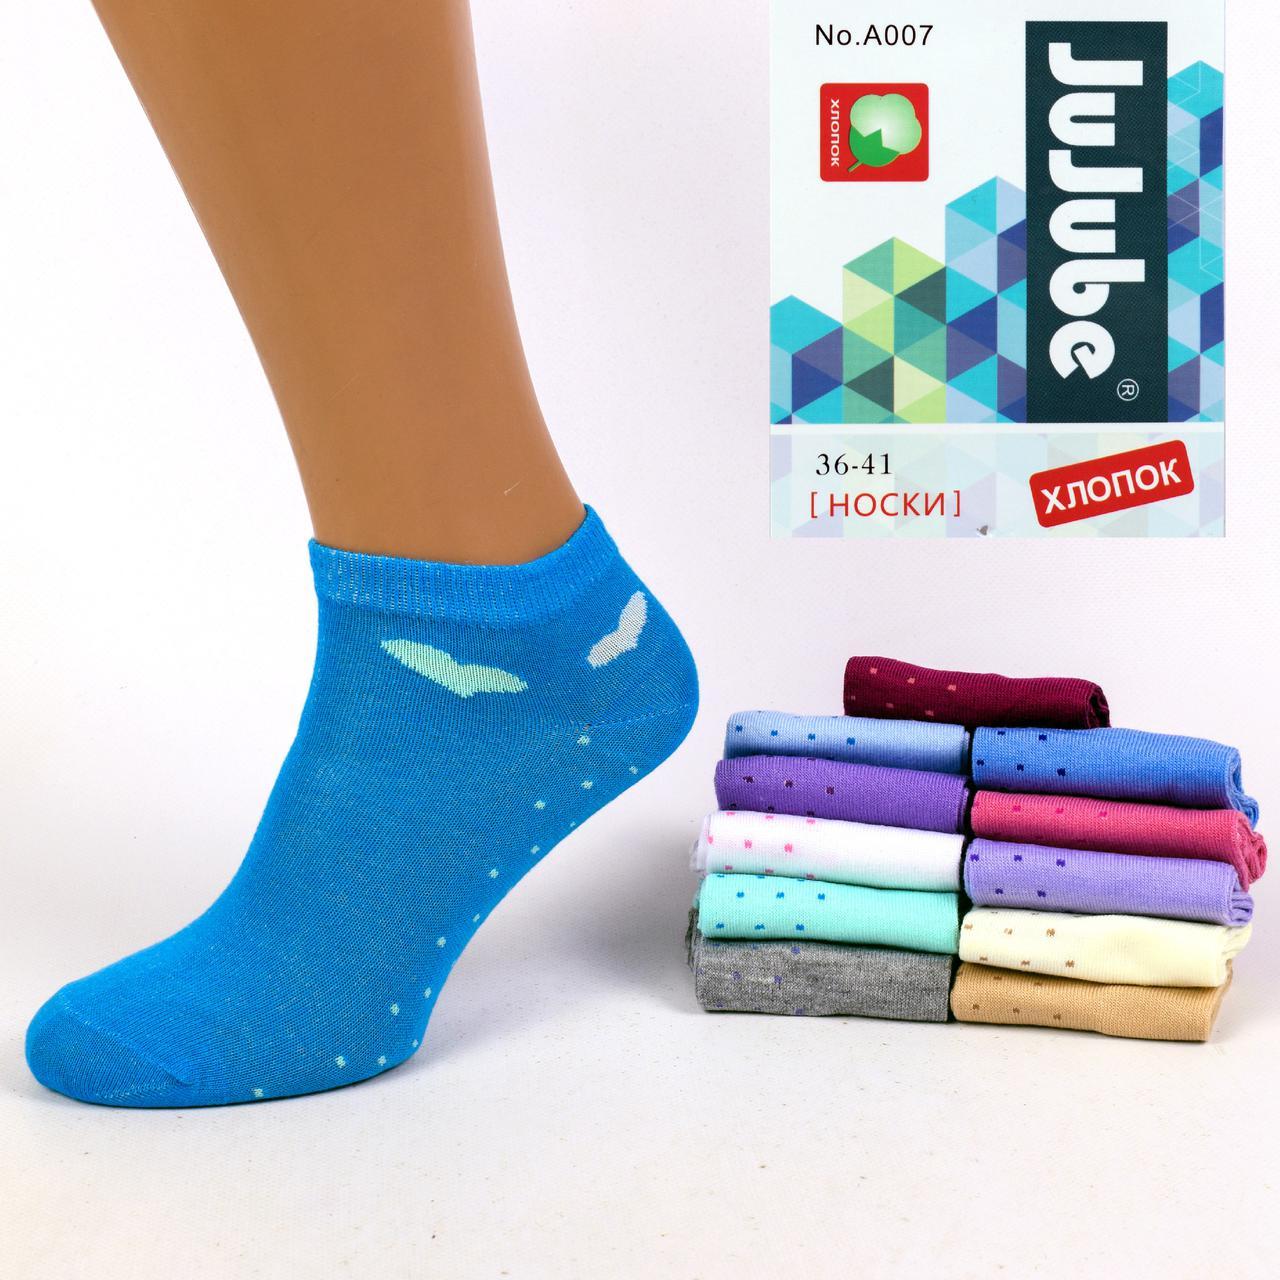 697f7502cd45 Женские короткие носки Jujube A007-5. В упаковке 12 пар.